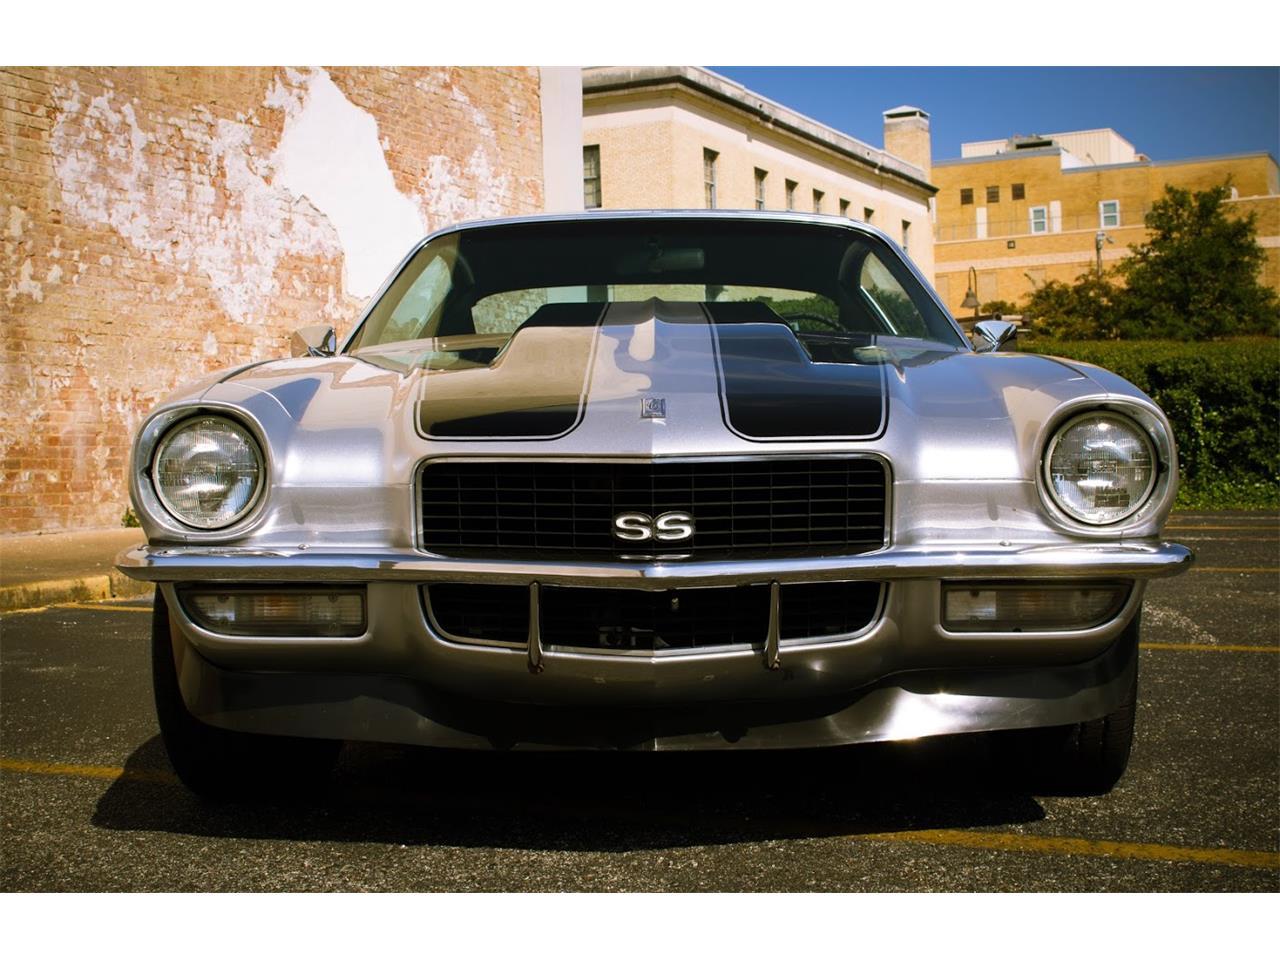 1970 Chevrolet Camaro SS (CC-1415983) for sale in Hallsville, Texas